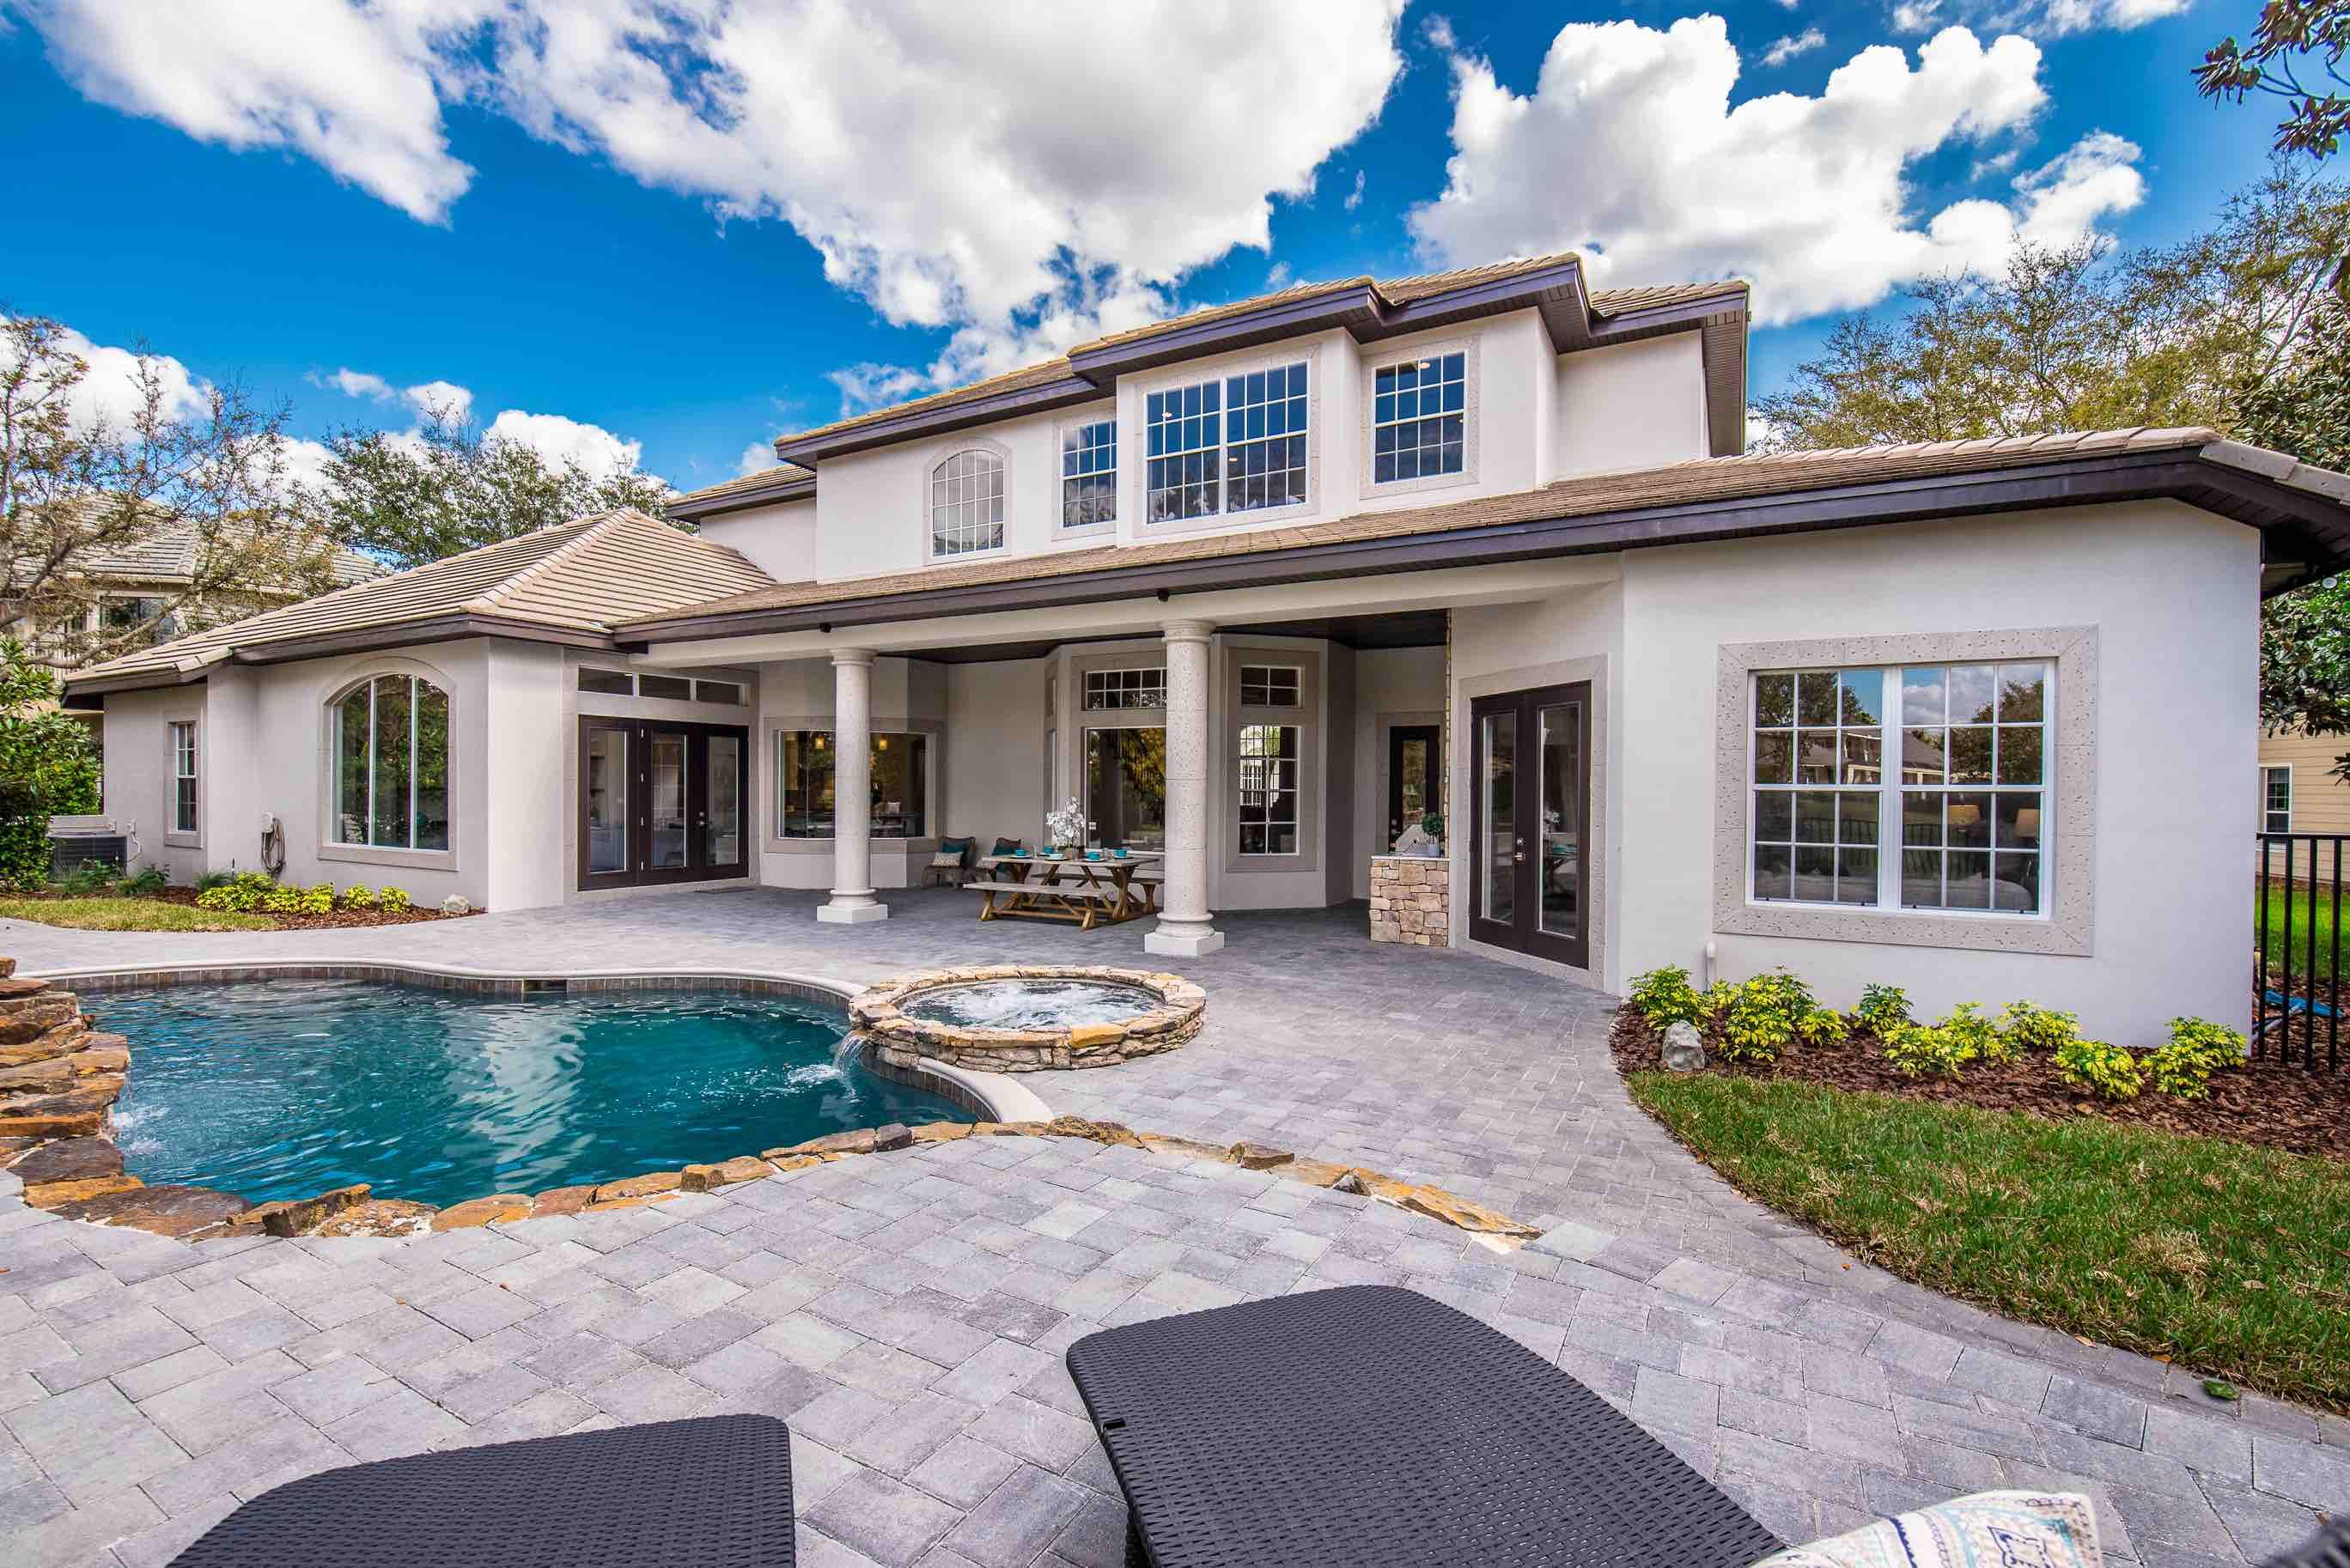 Real Estate Photographer - My Visual Listings Orlando